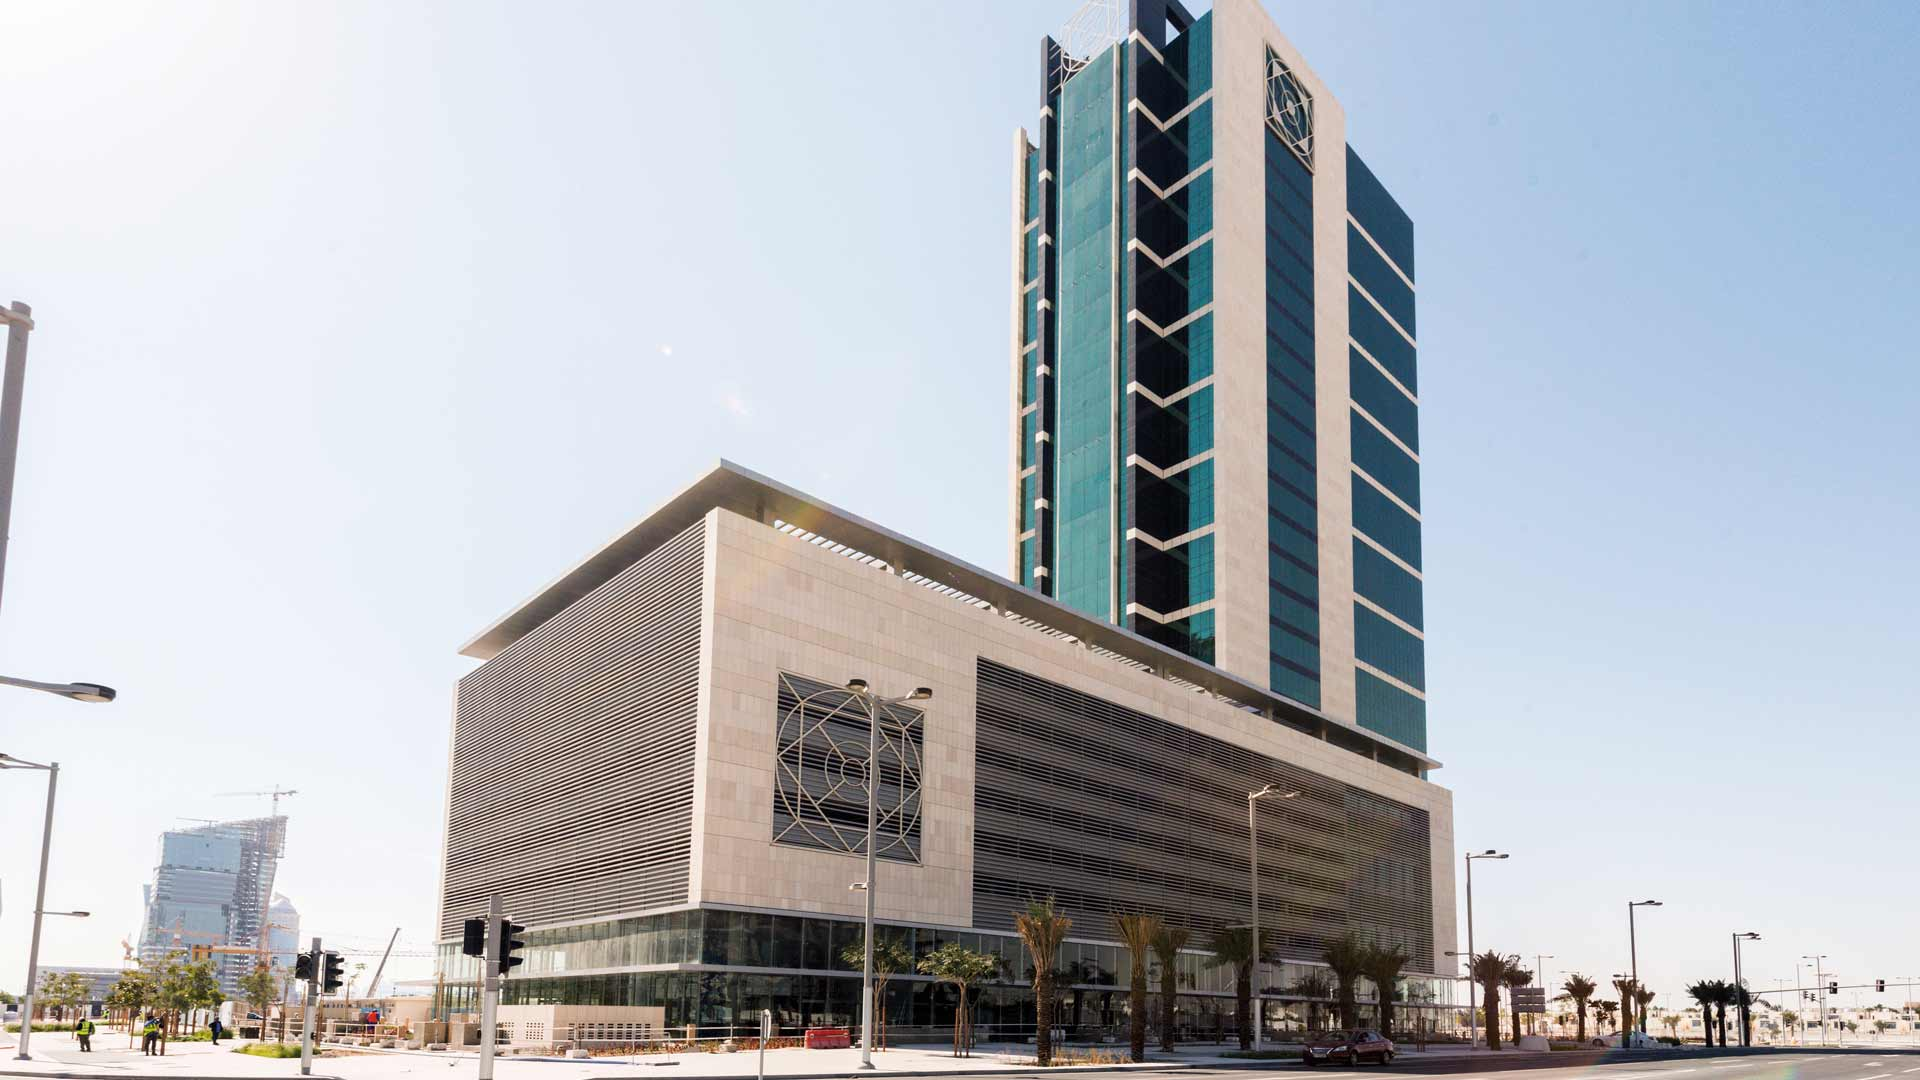 Edificio en Doha, Qatar